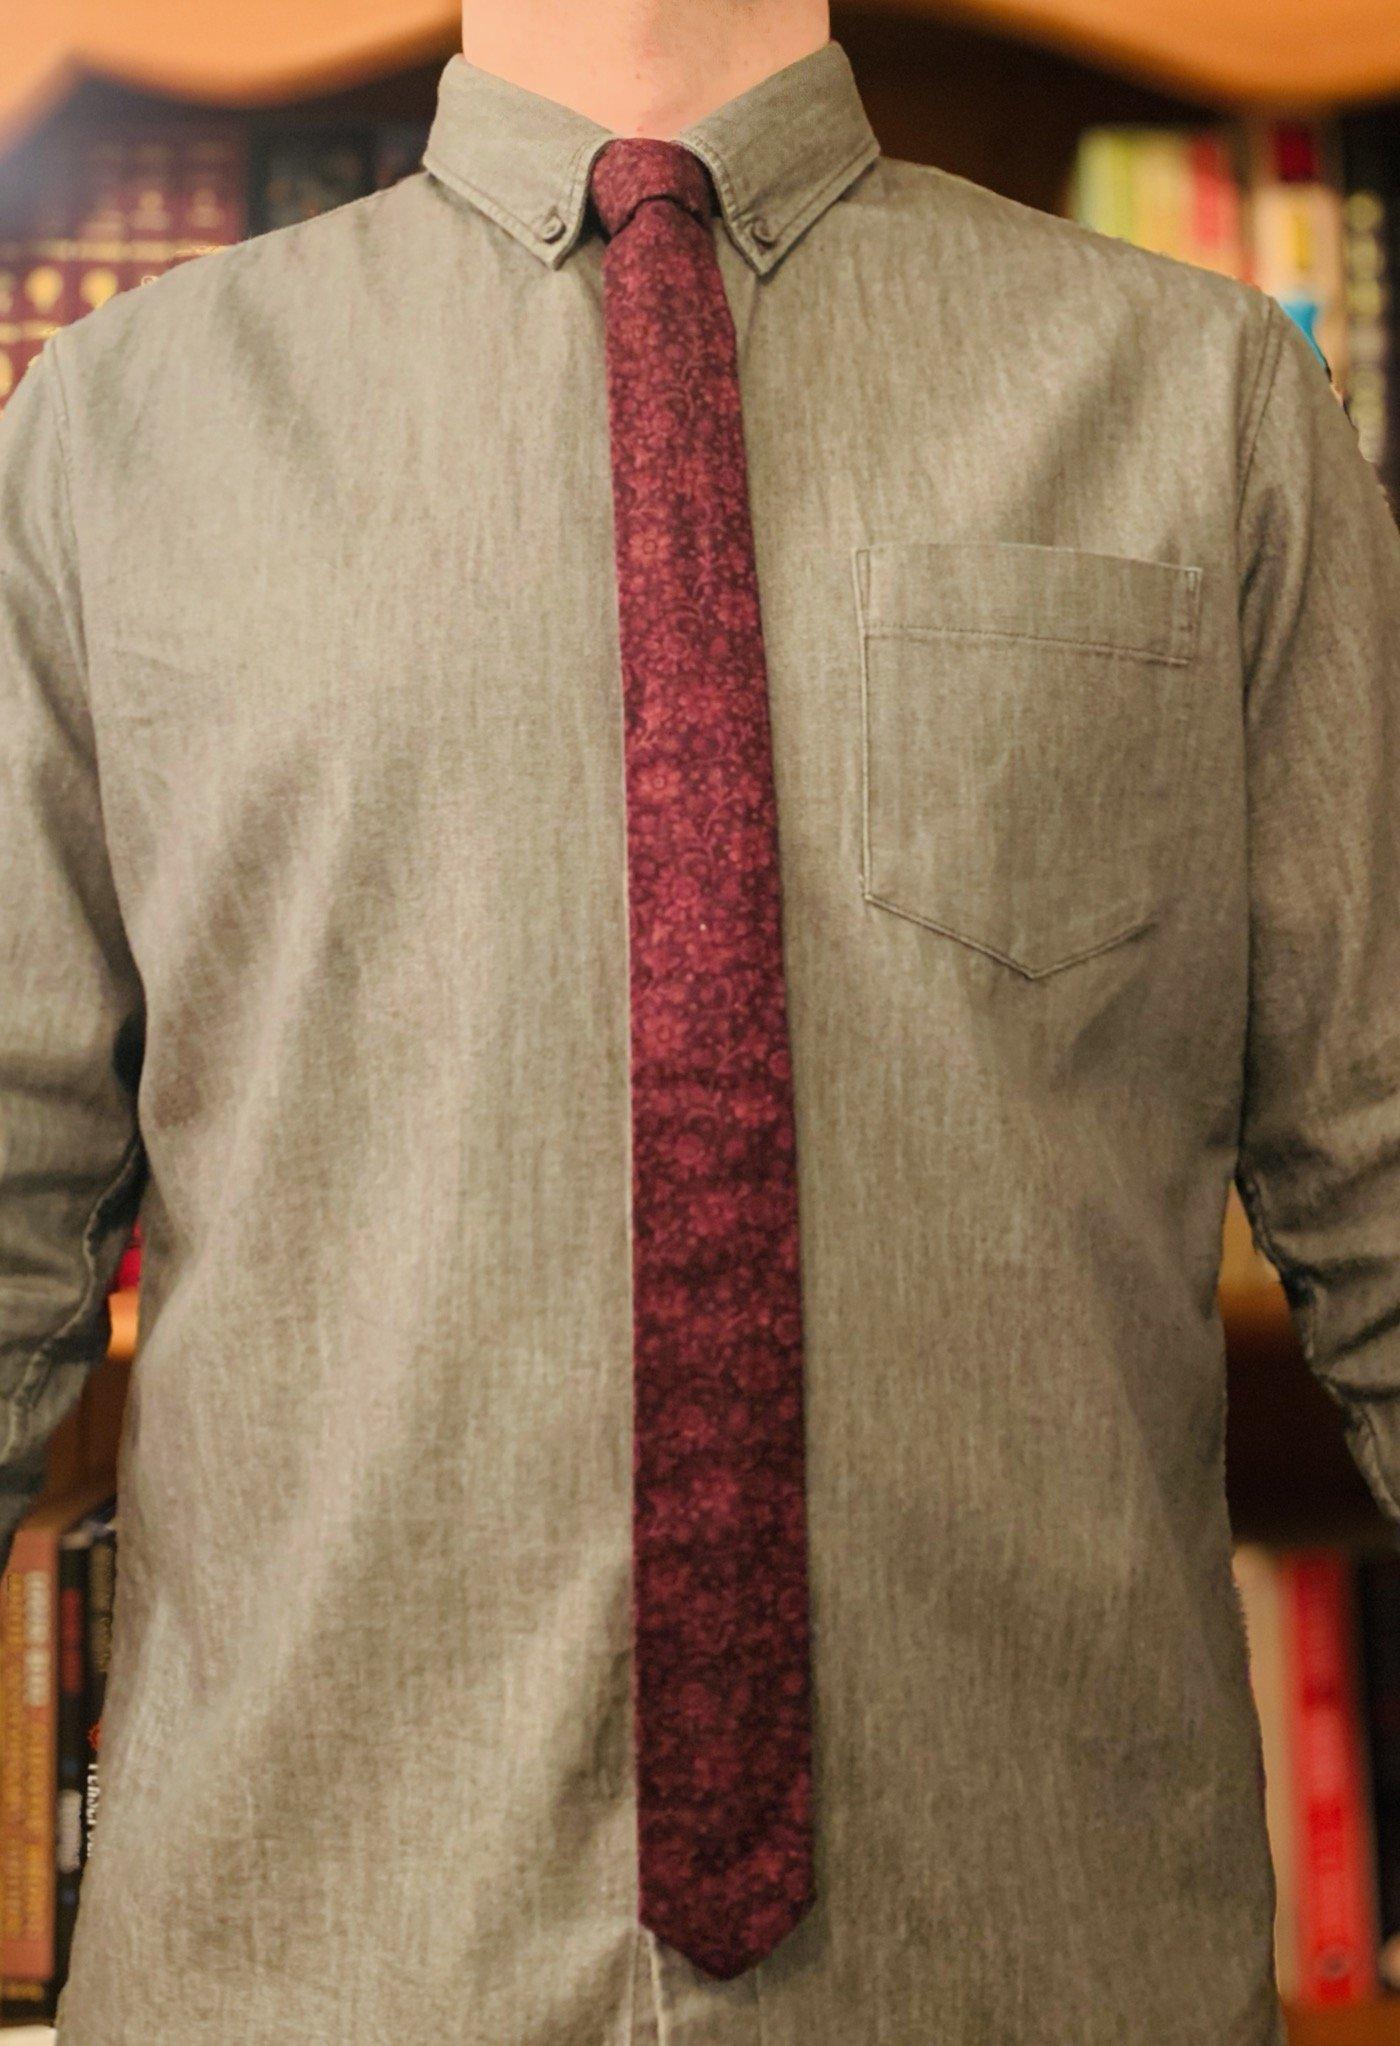 Full Purple Tie